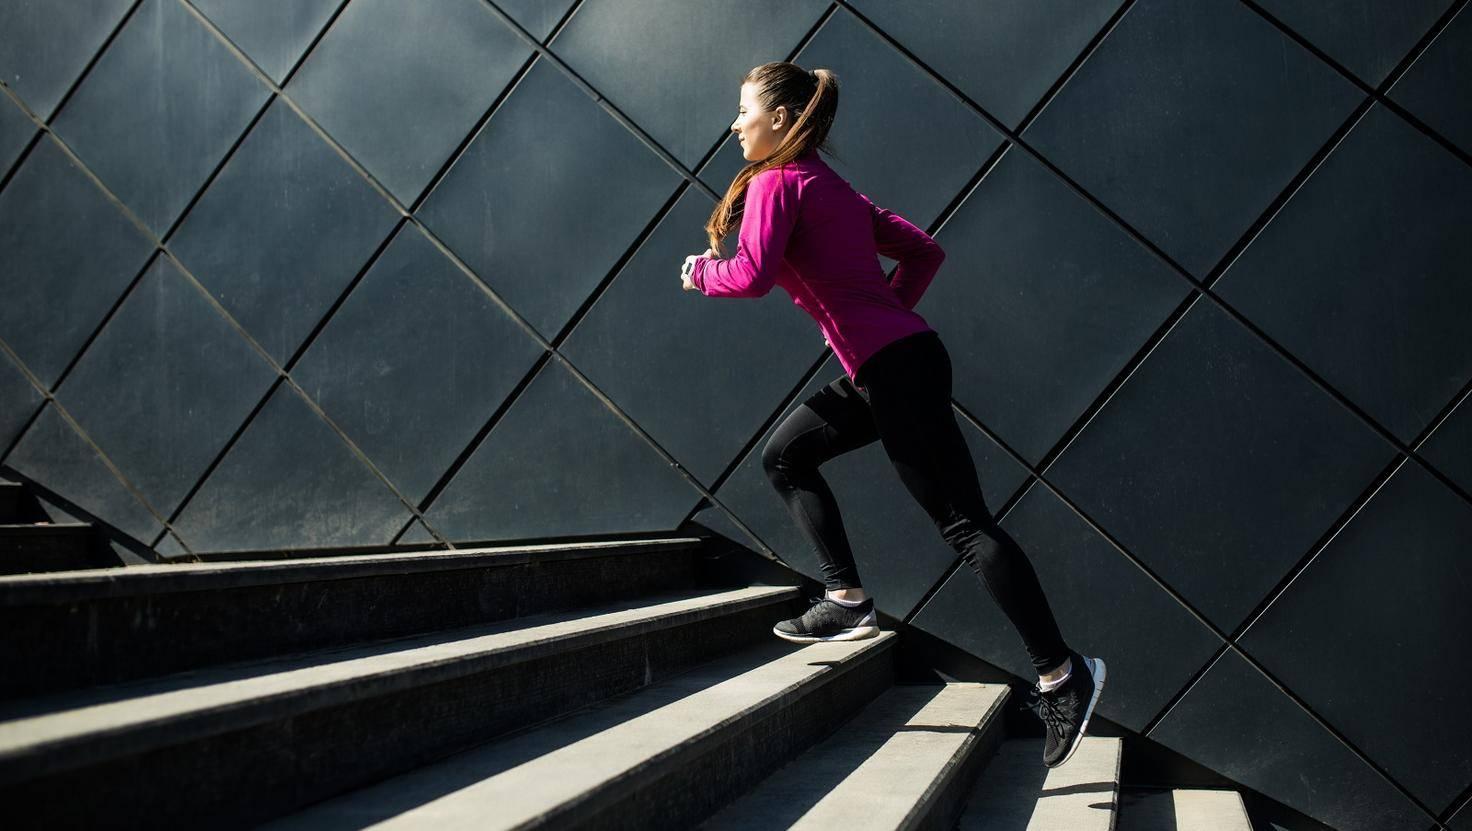 Fitness-Tracker Treppen Stufen laufen Joggerin